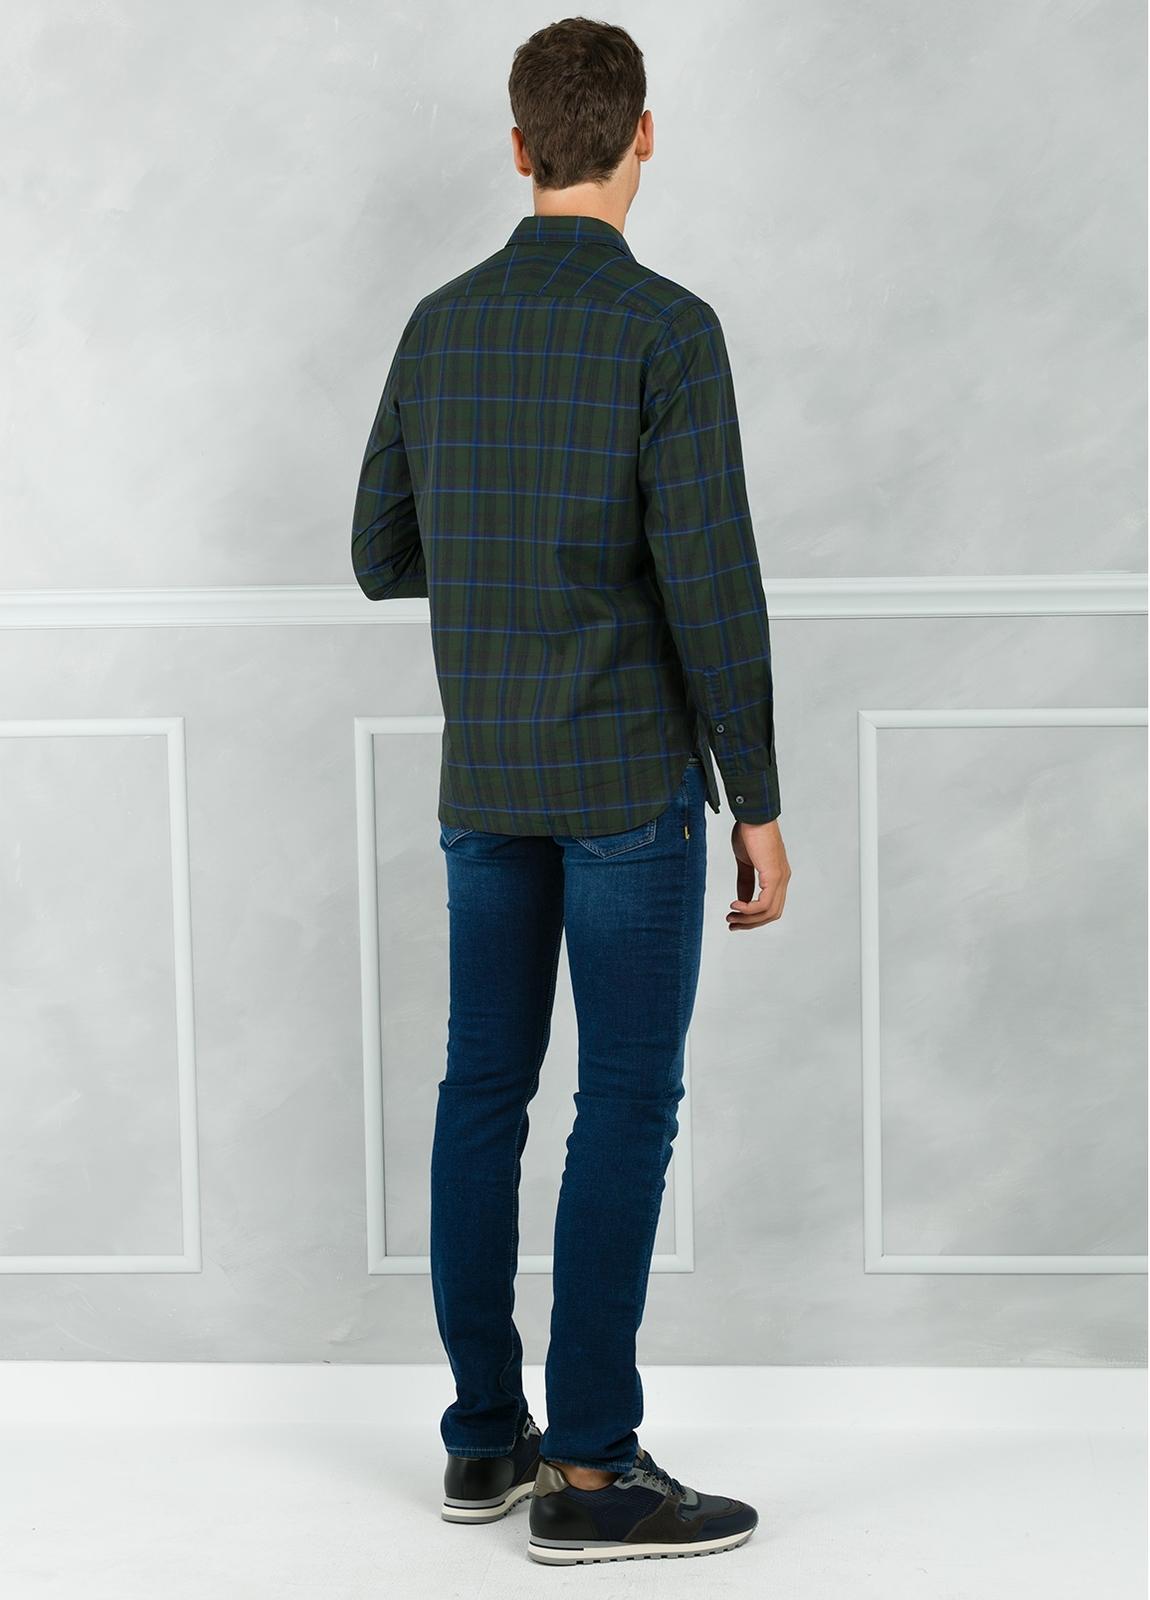 Camisa sport modelo EDDI cuadros color verde. 100% Algodón lavado. - Ítem1